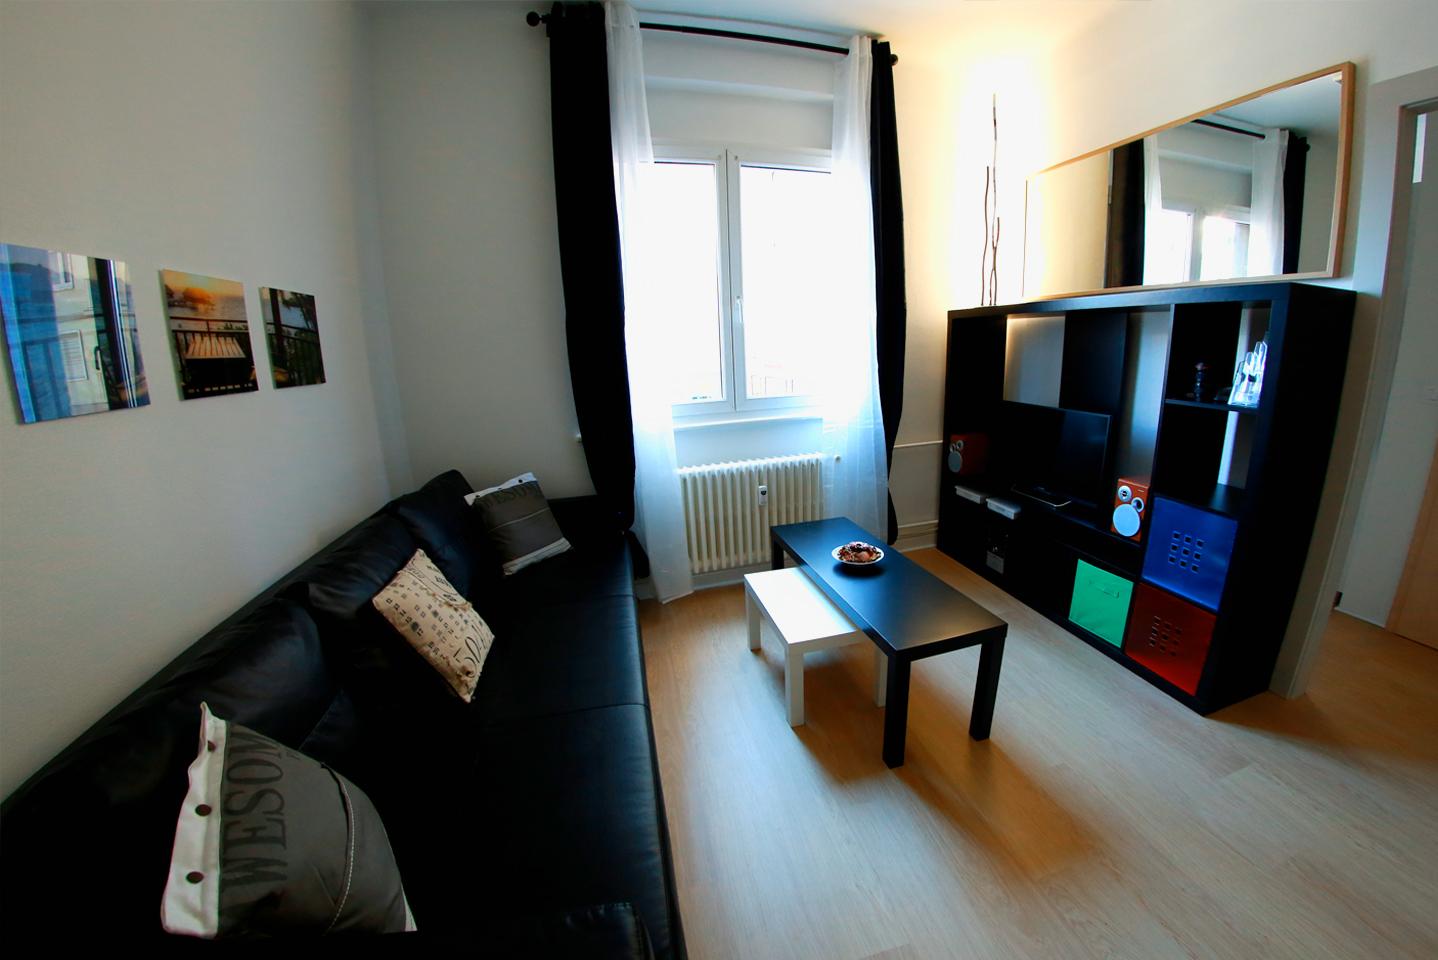 VENVICI.FR Airbnb